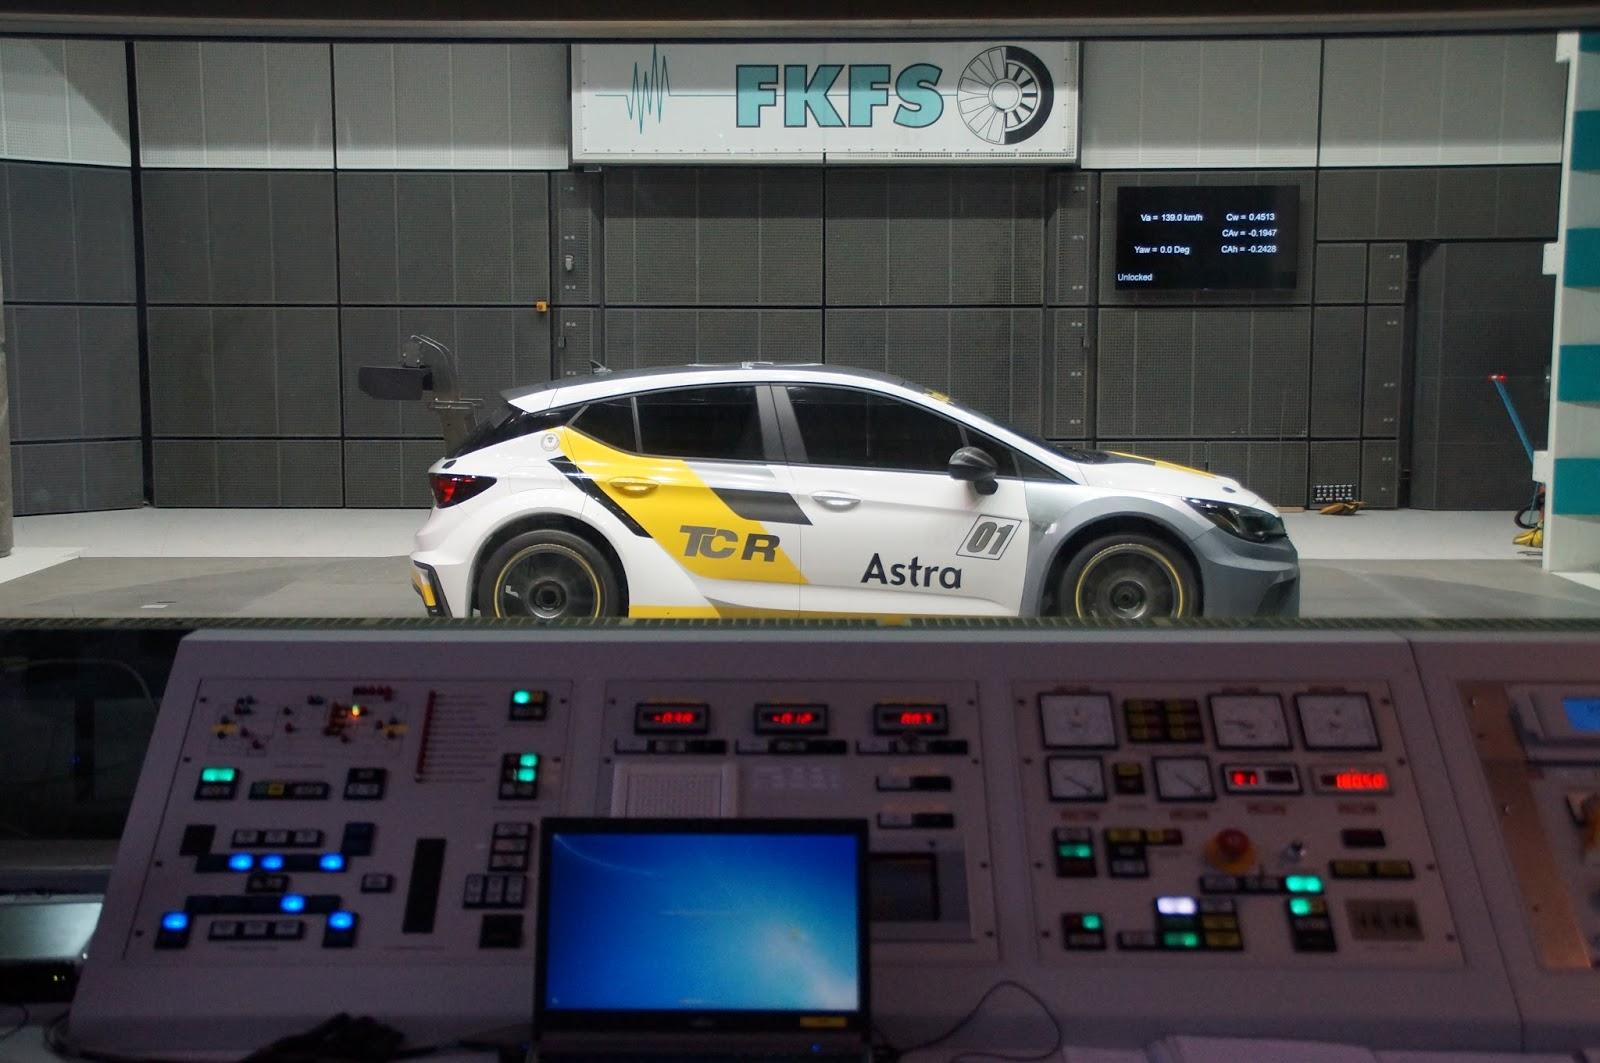 Opel Astra TCR 300278 Τελειοποιώντας την αεροδυναμική του Astra Opel, Opel Astra, Opel Astra TCR, Rally, Τεχνολογία